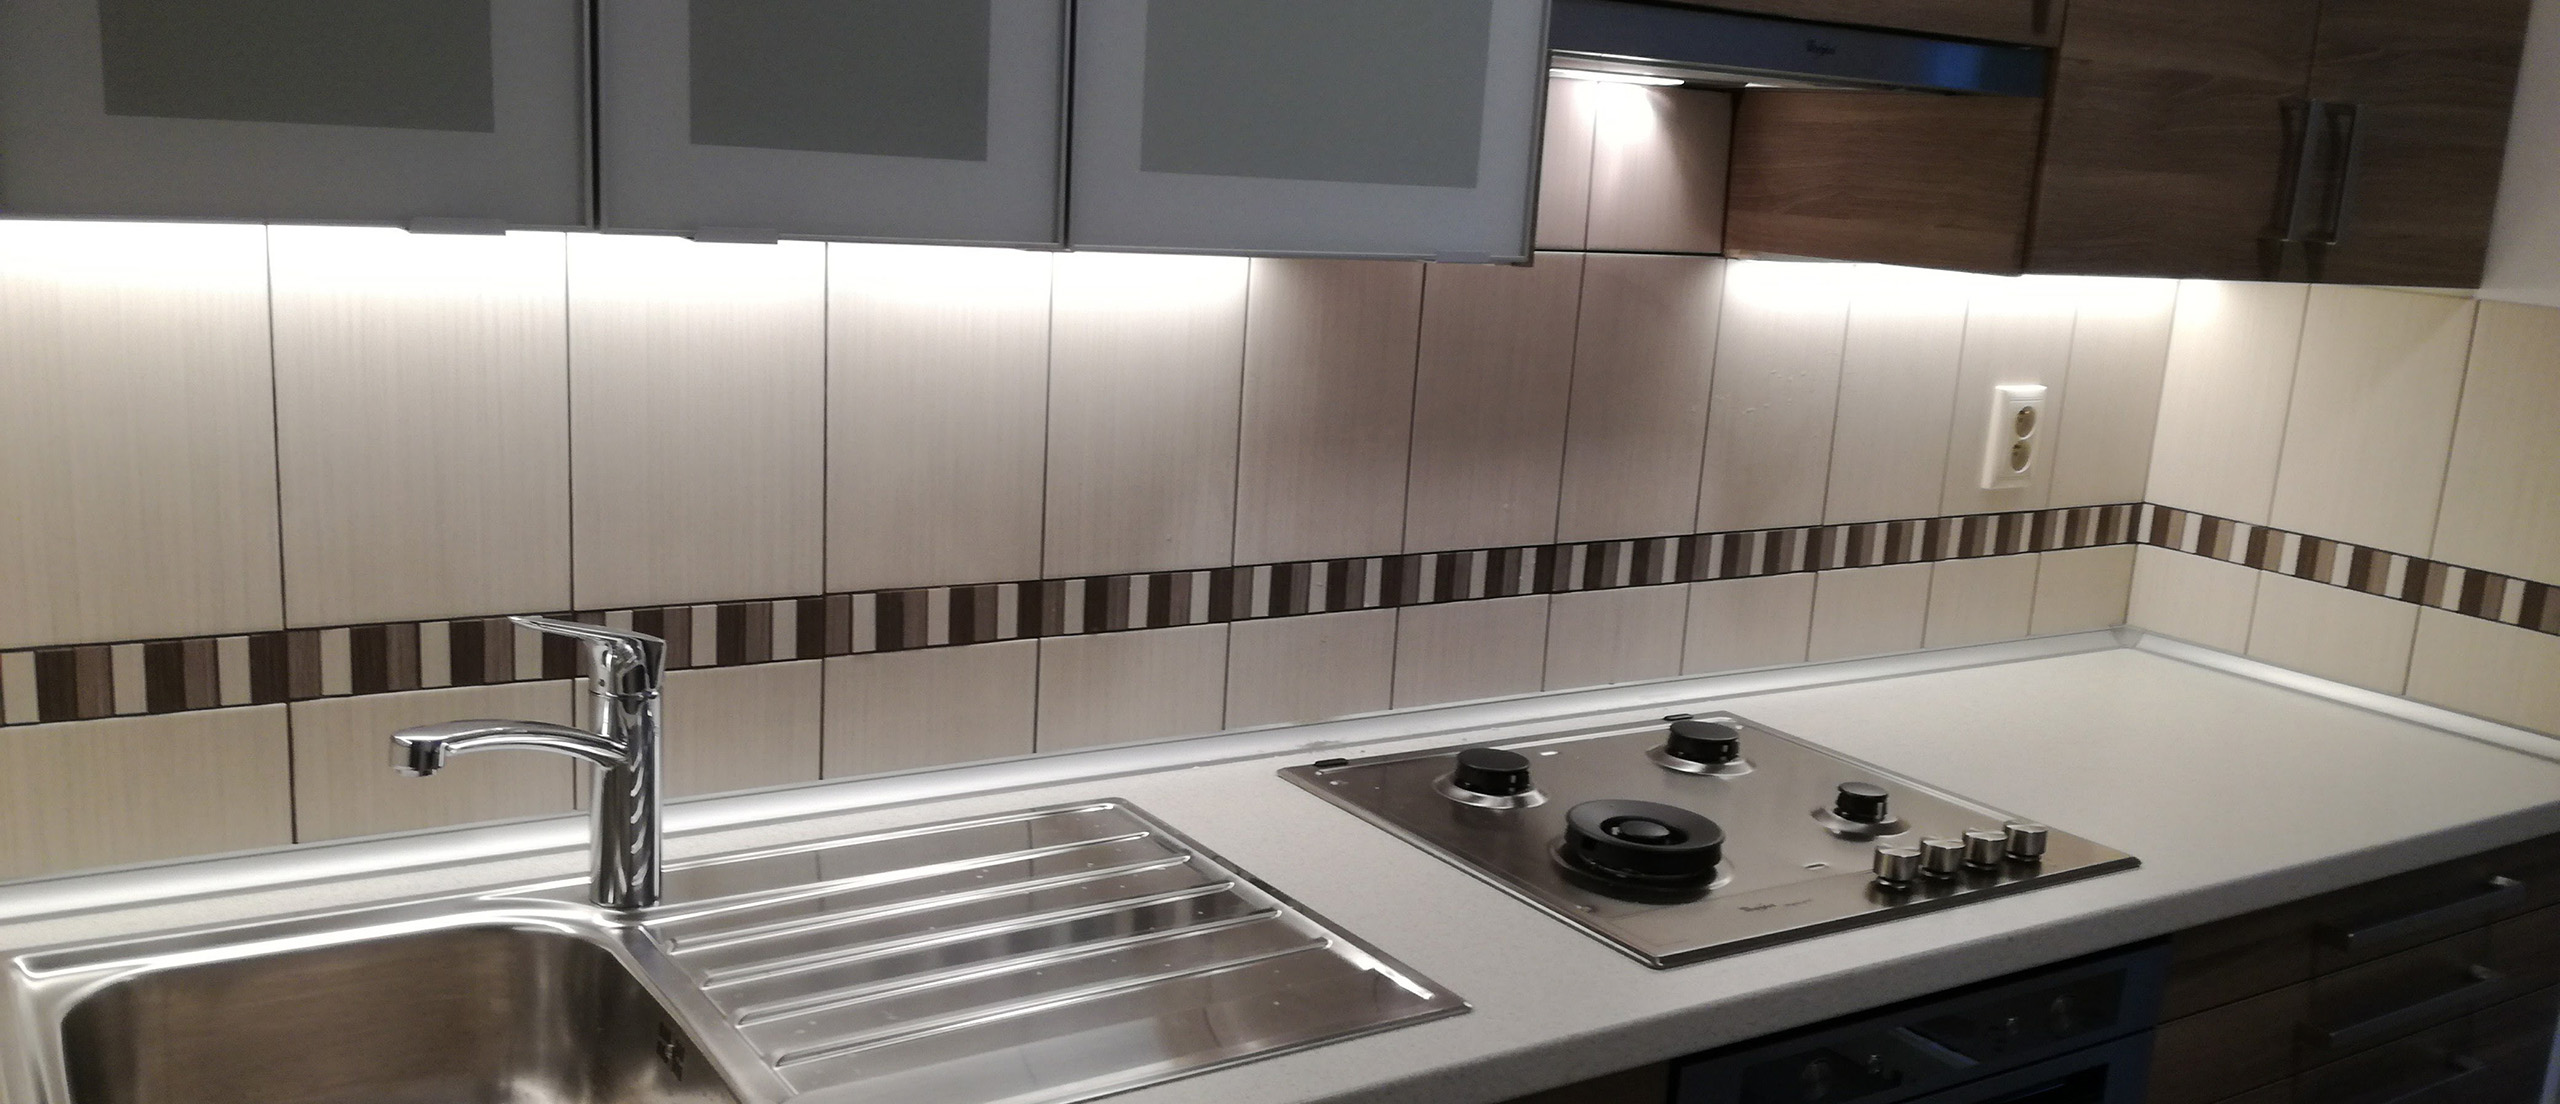 kuchynske linky bratislava